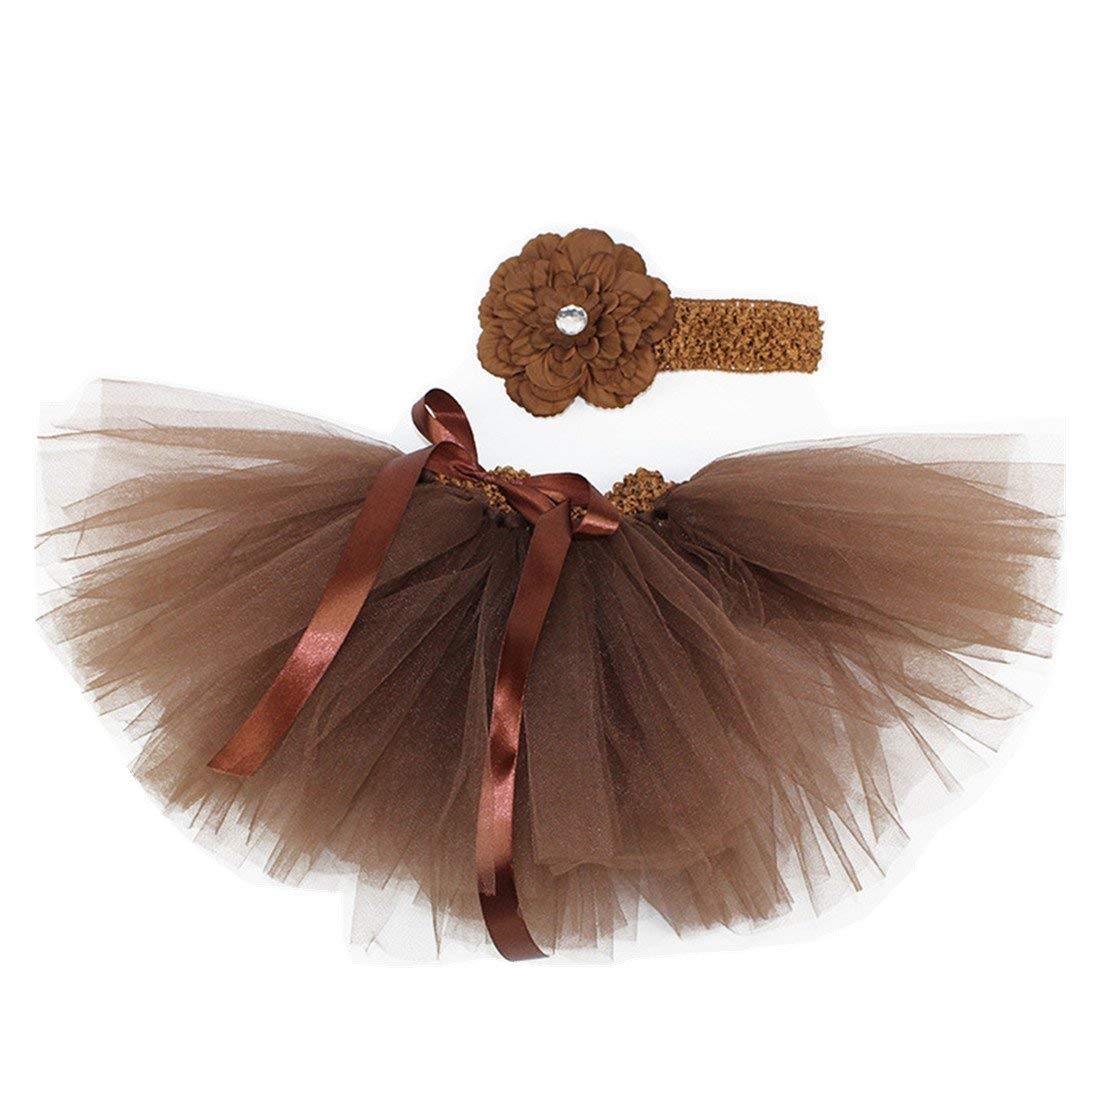 9d09205dd43 Get Quotations · MizHome Newborn Baby Girls Birthday Layered Tulle Tutu  Skirt Flower Headwear Outfits